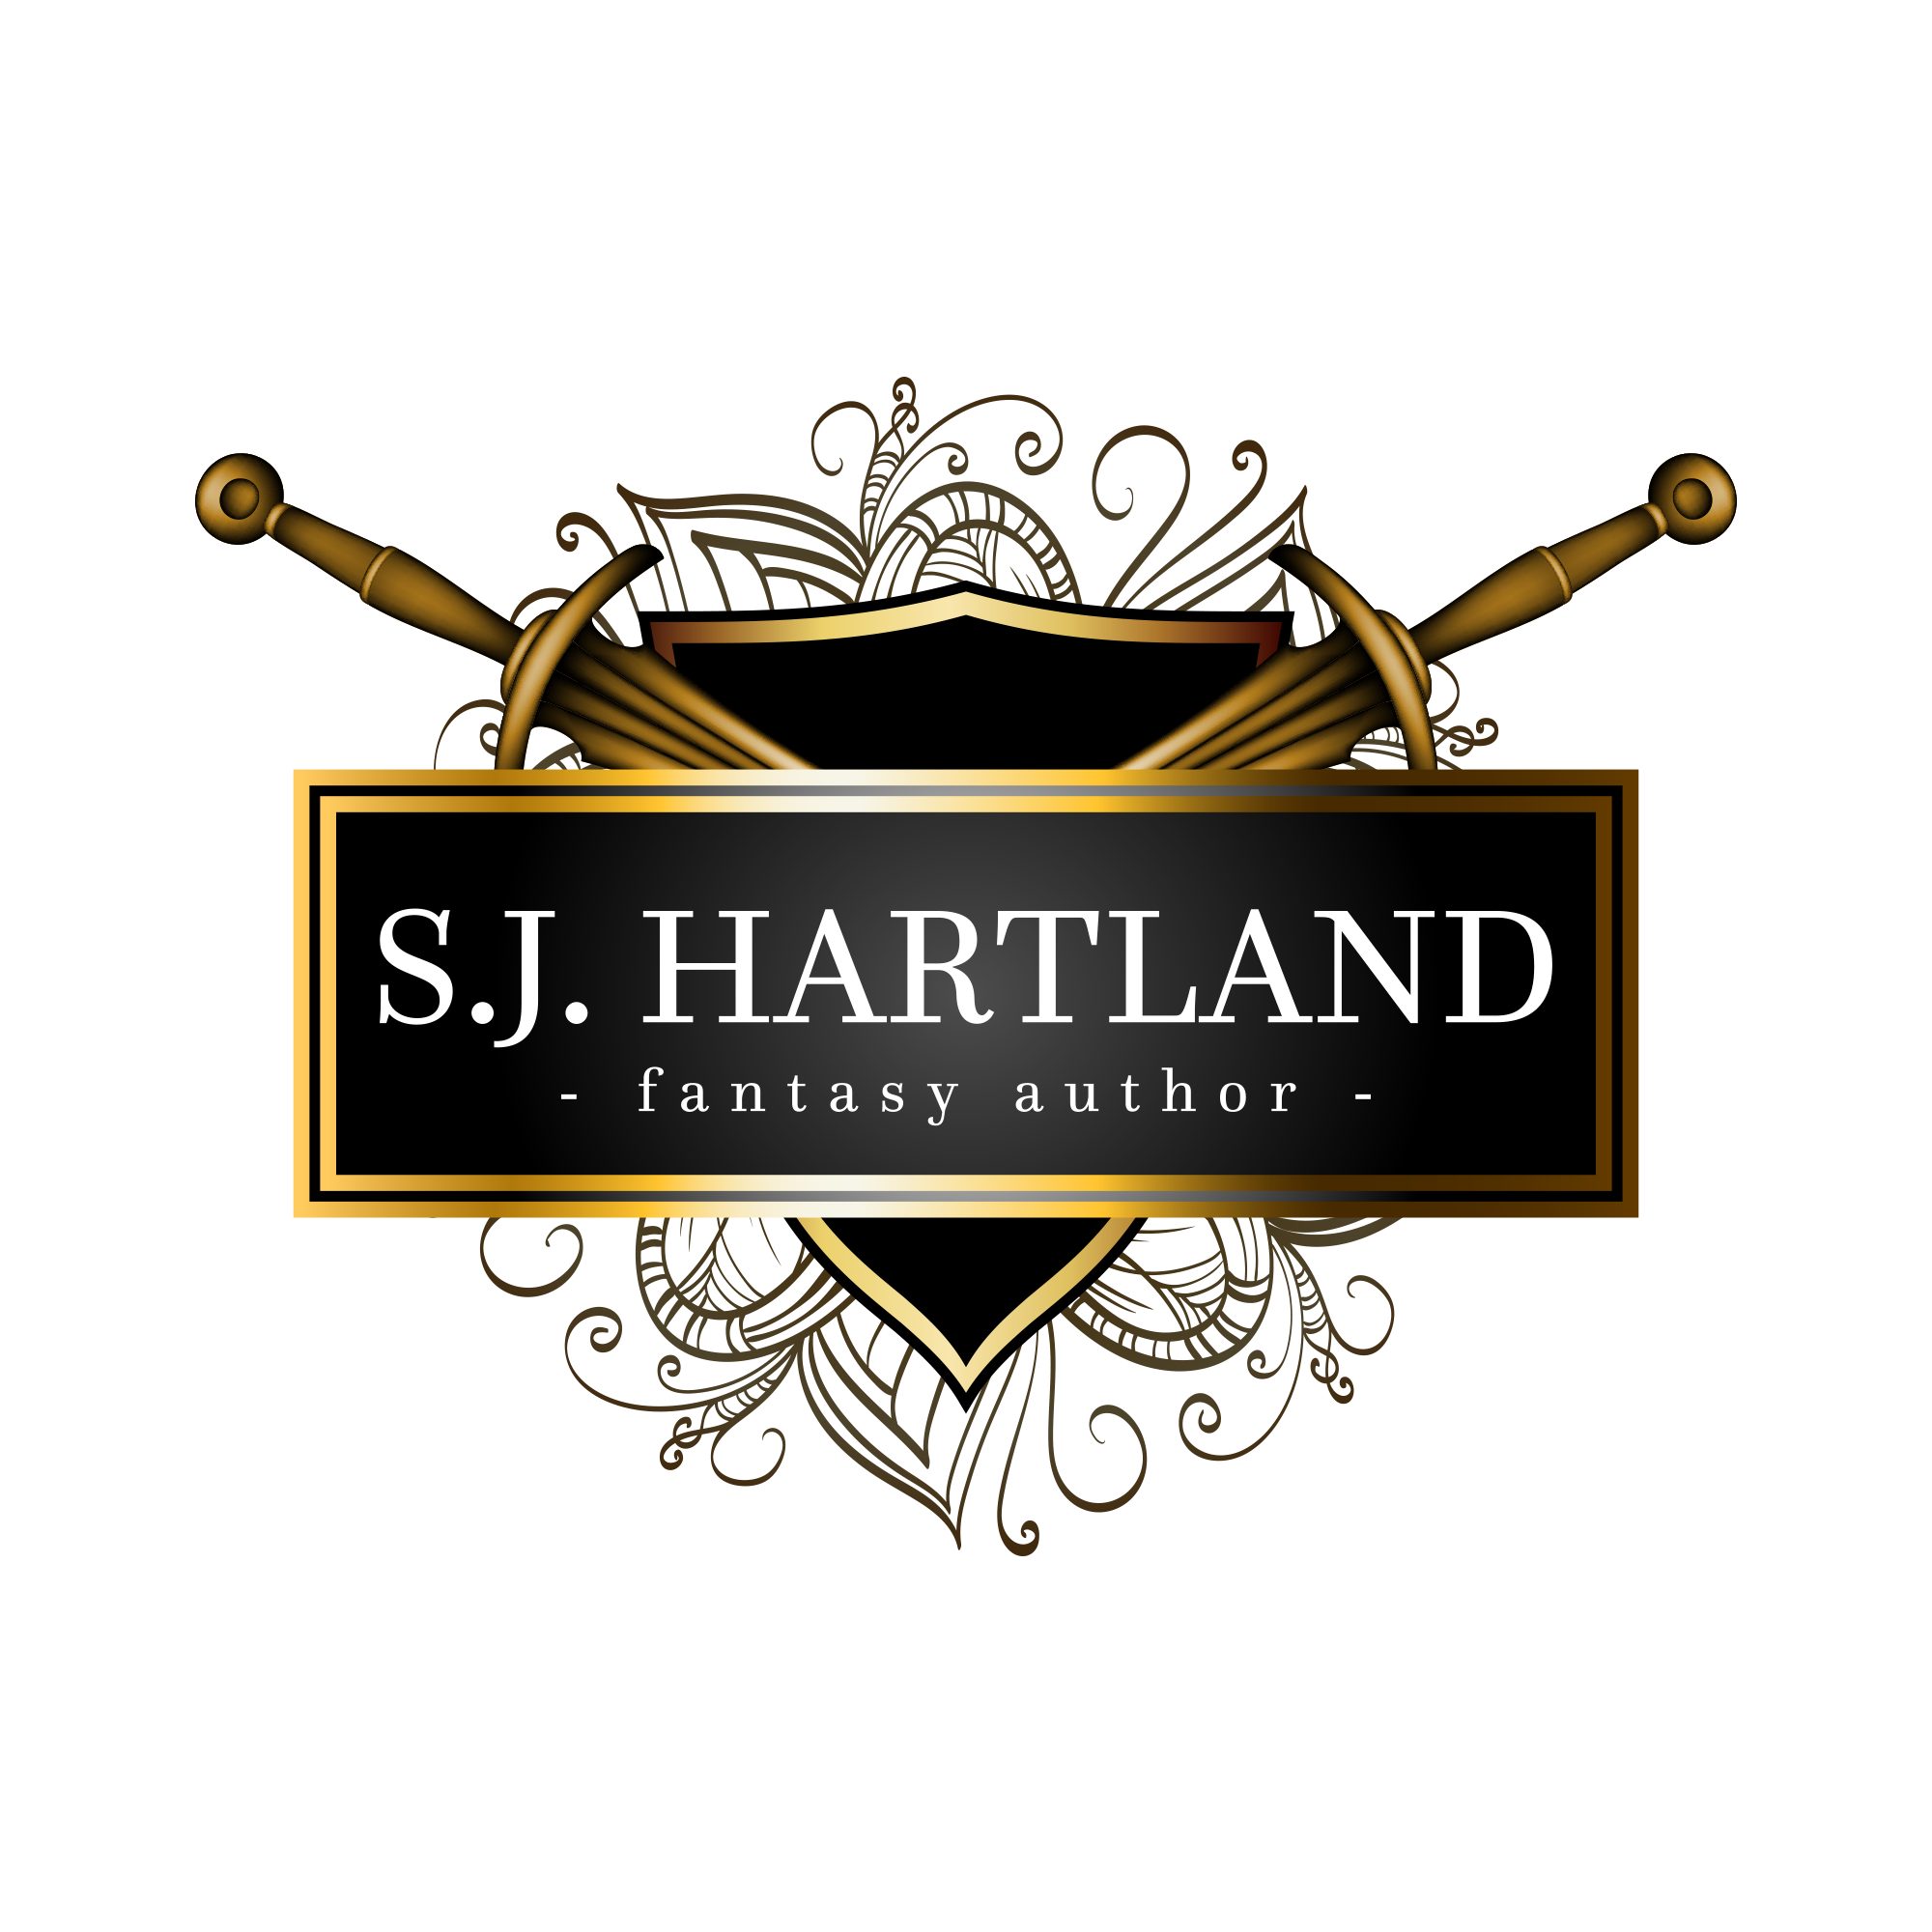 Author S J Hartland